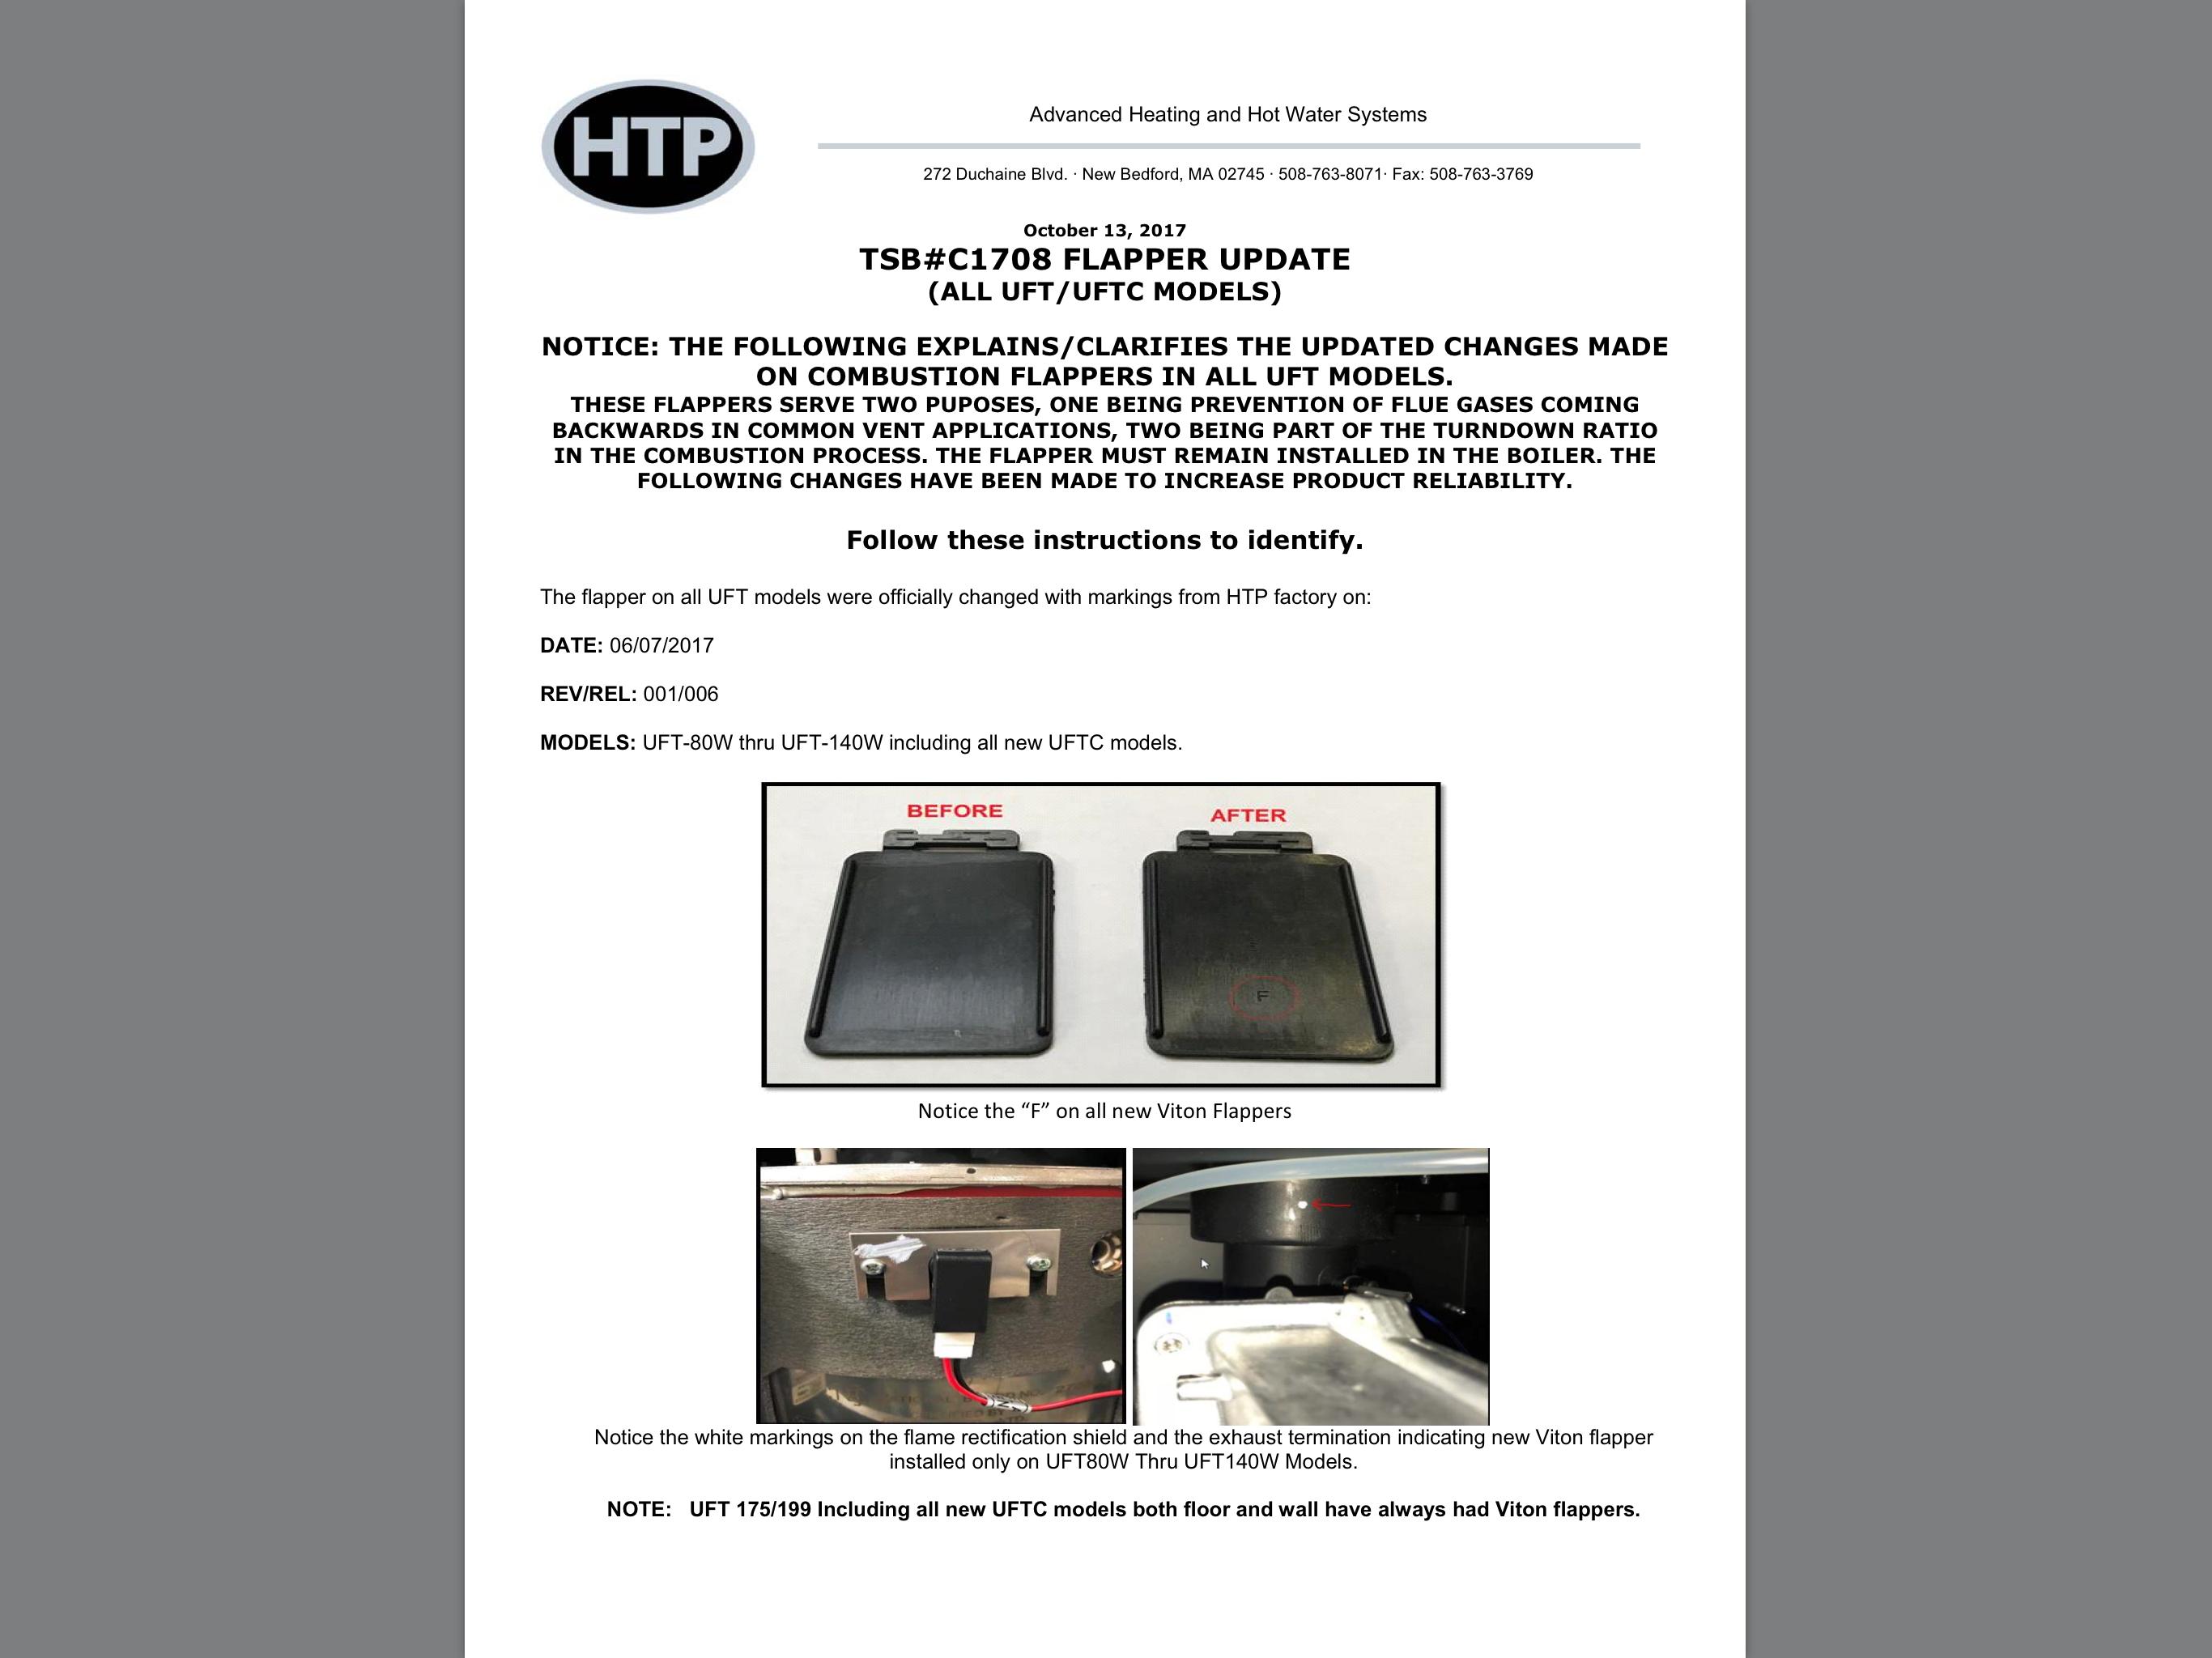 Emerson Manual K4 Electric Rice Cooker Wiring Diagram Http Wwwtheietorg Forums Forum Array Htp Uft Problem U2014 Heating Help The Wall Rh Heatinghelp Com